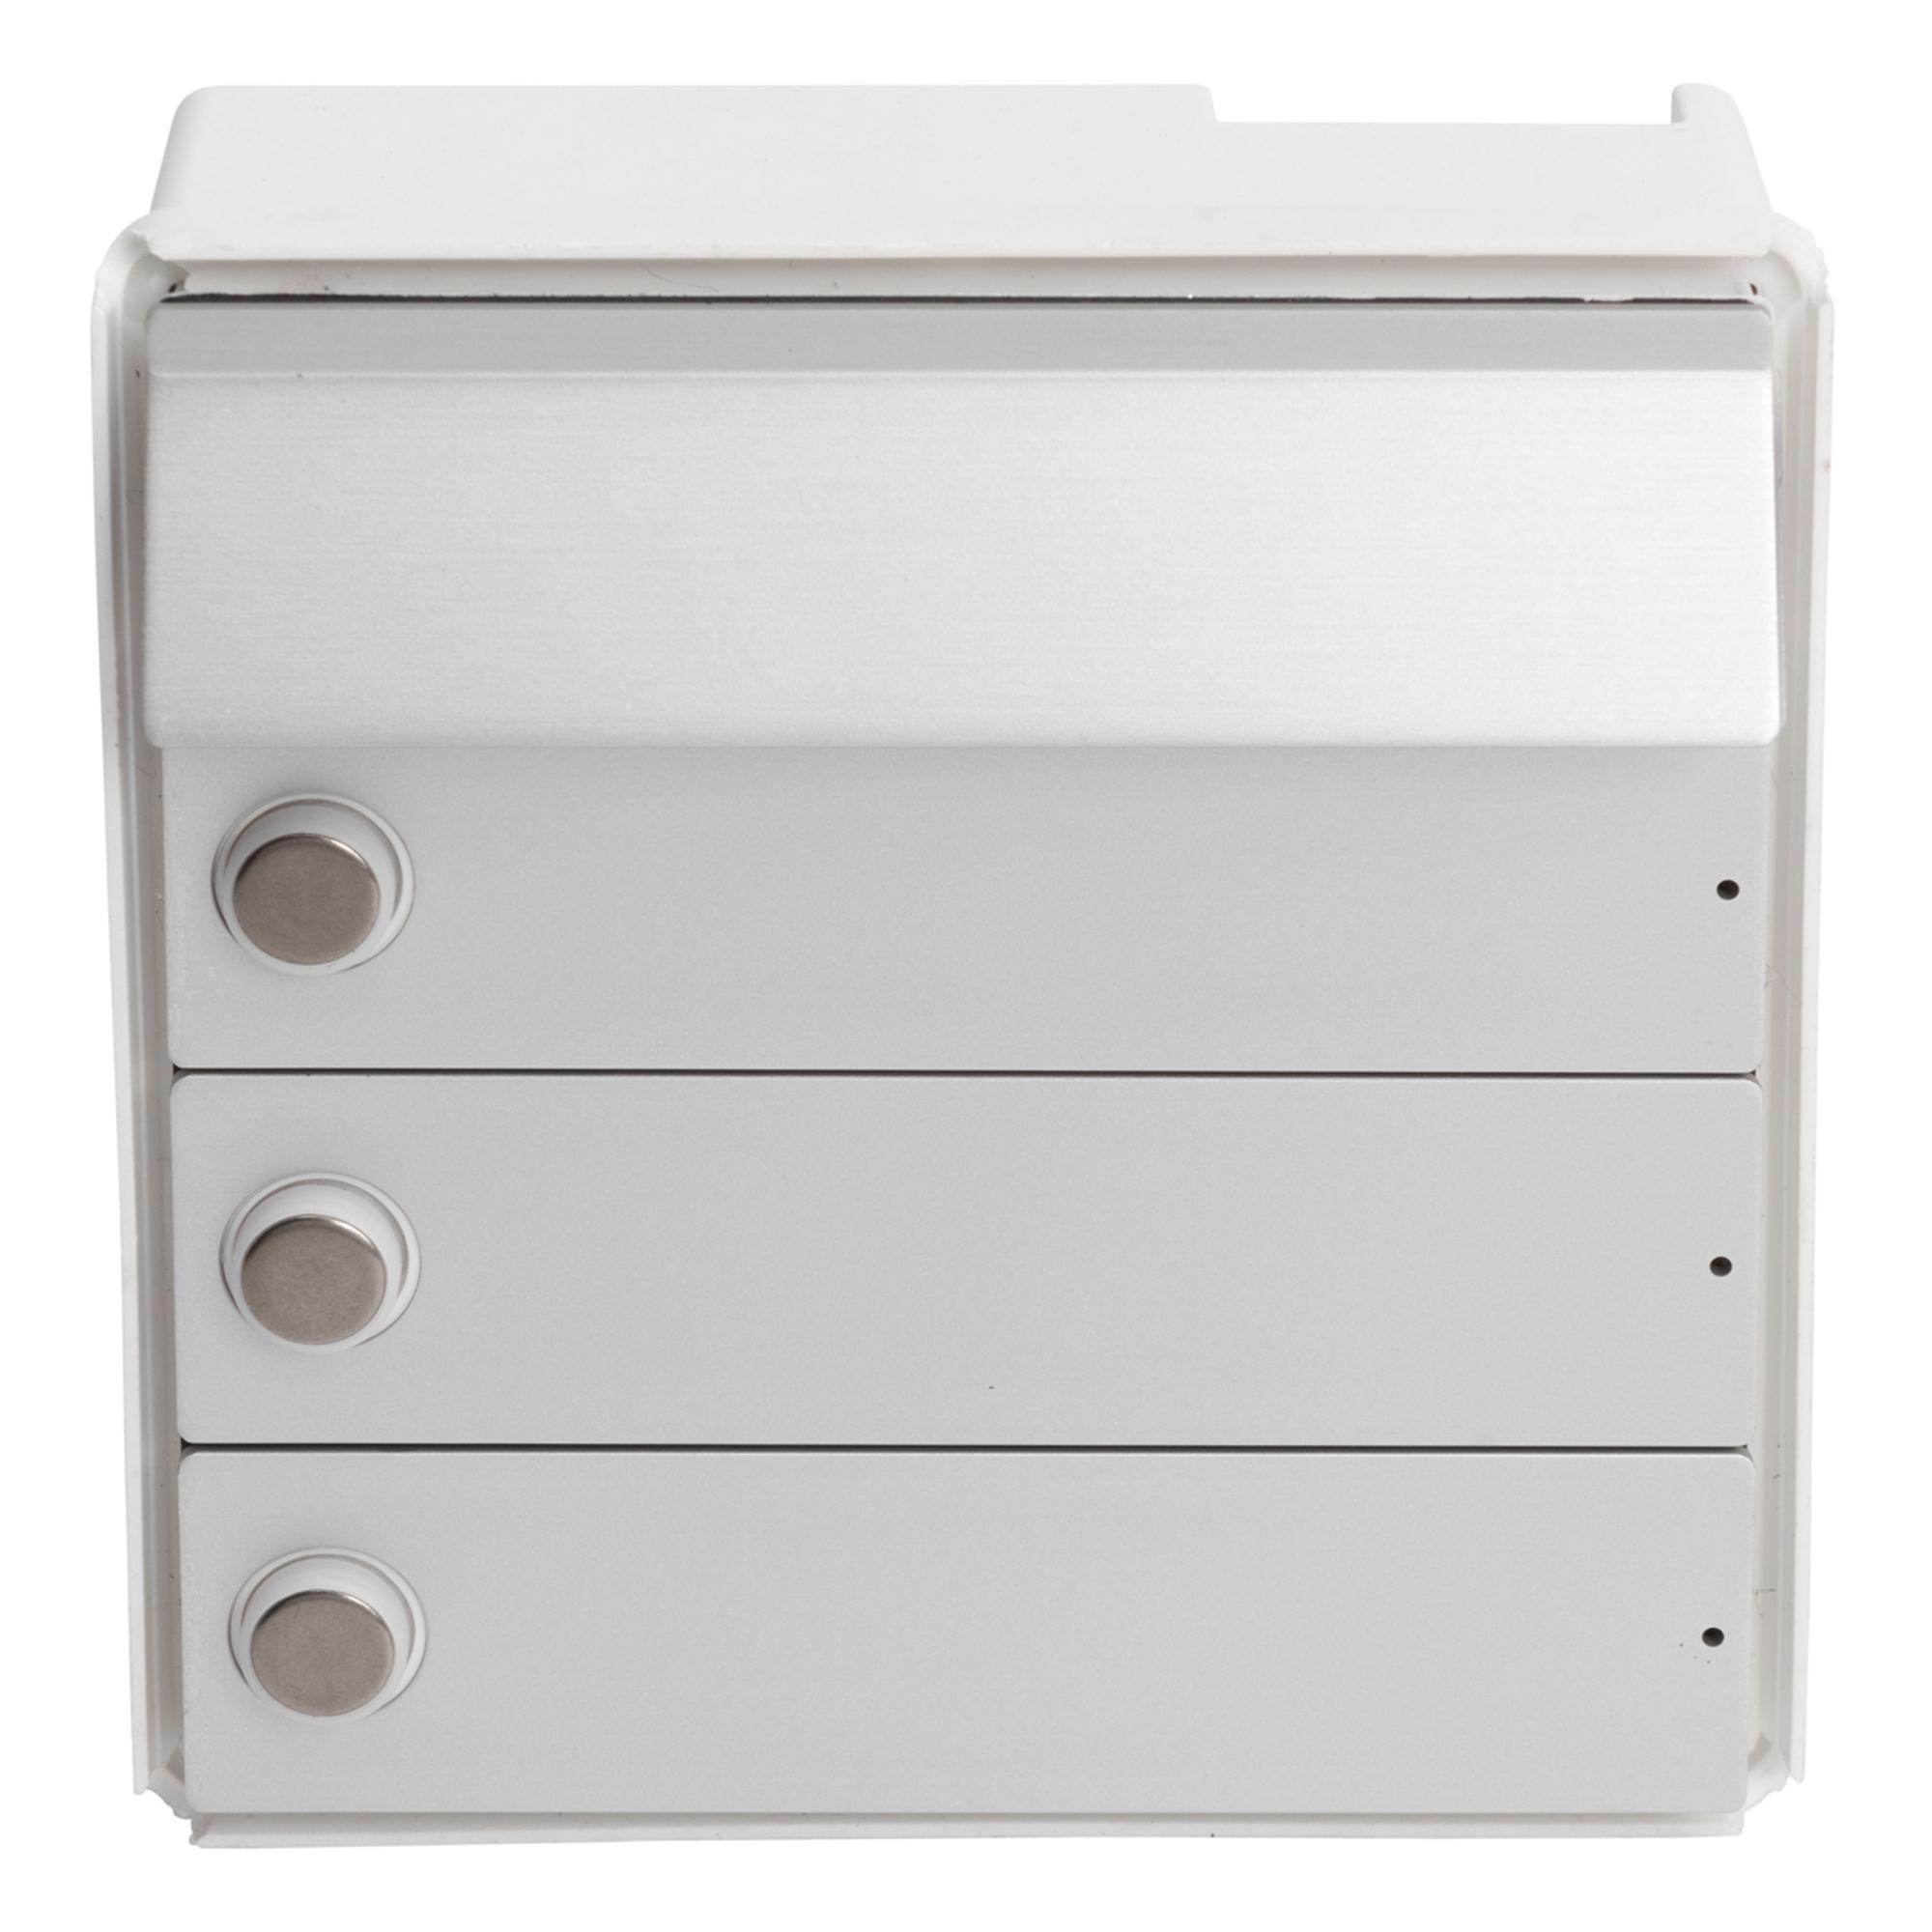 RENZ Tastenmodul RSA2 kompakt - 3 Klingeln-Aluminium 97-9-85334